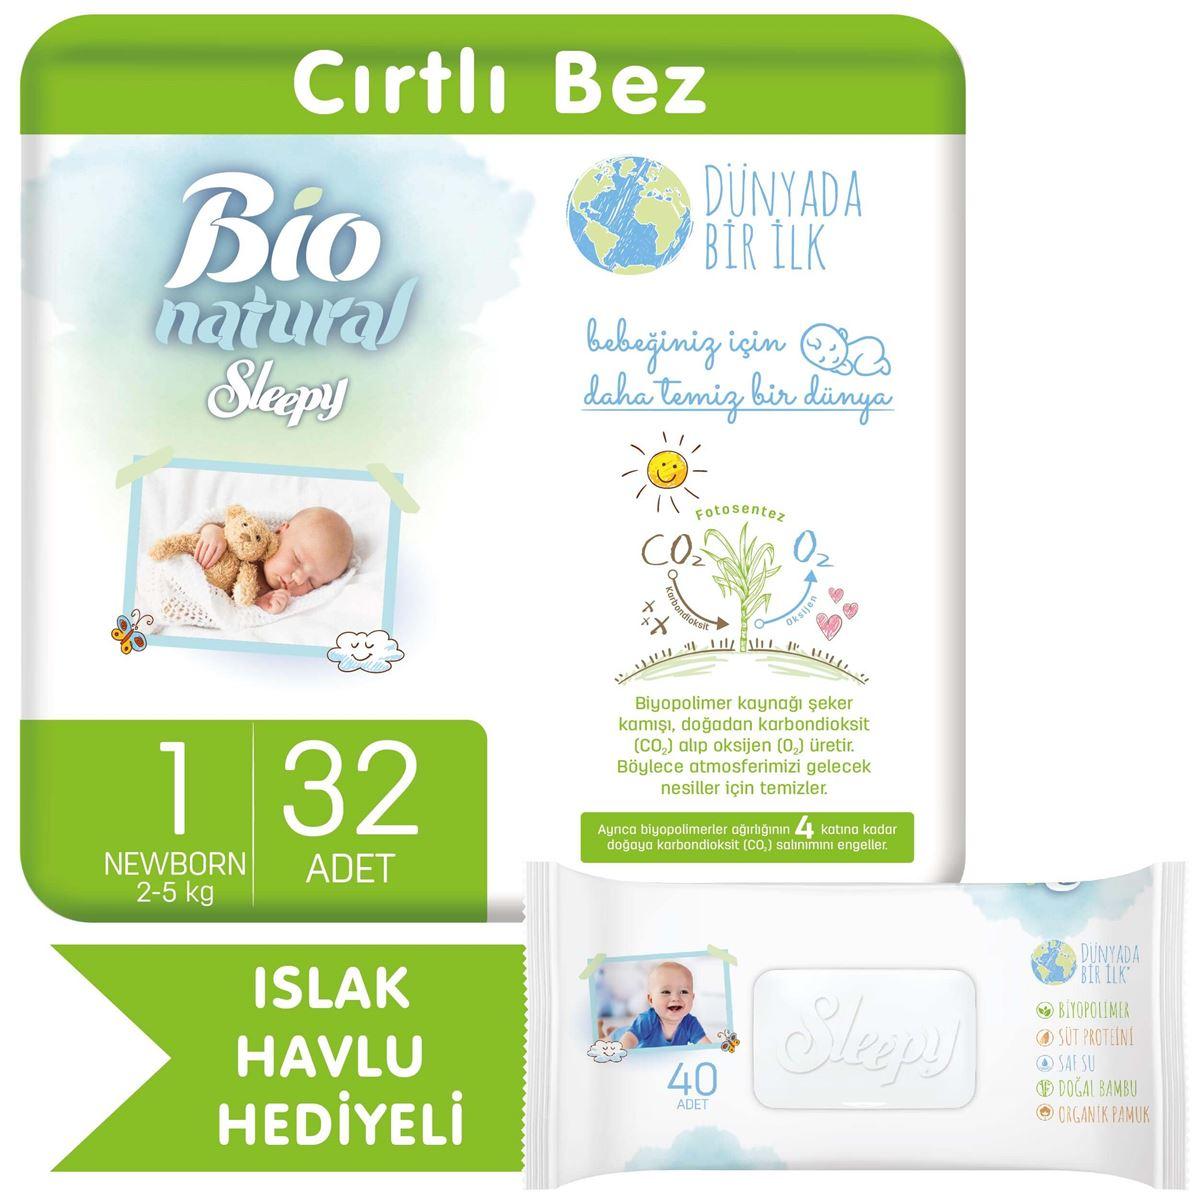 Bio Natural Bebek Bezi 1 Numara Yenidoğan 32 Adet + Bio Natural Islak Havlu Hediyeli